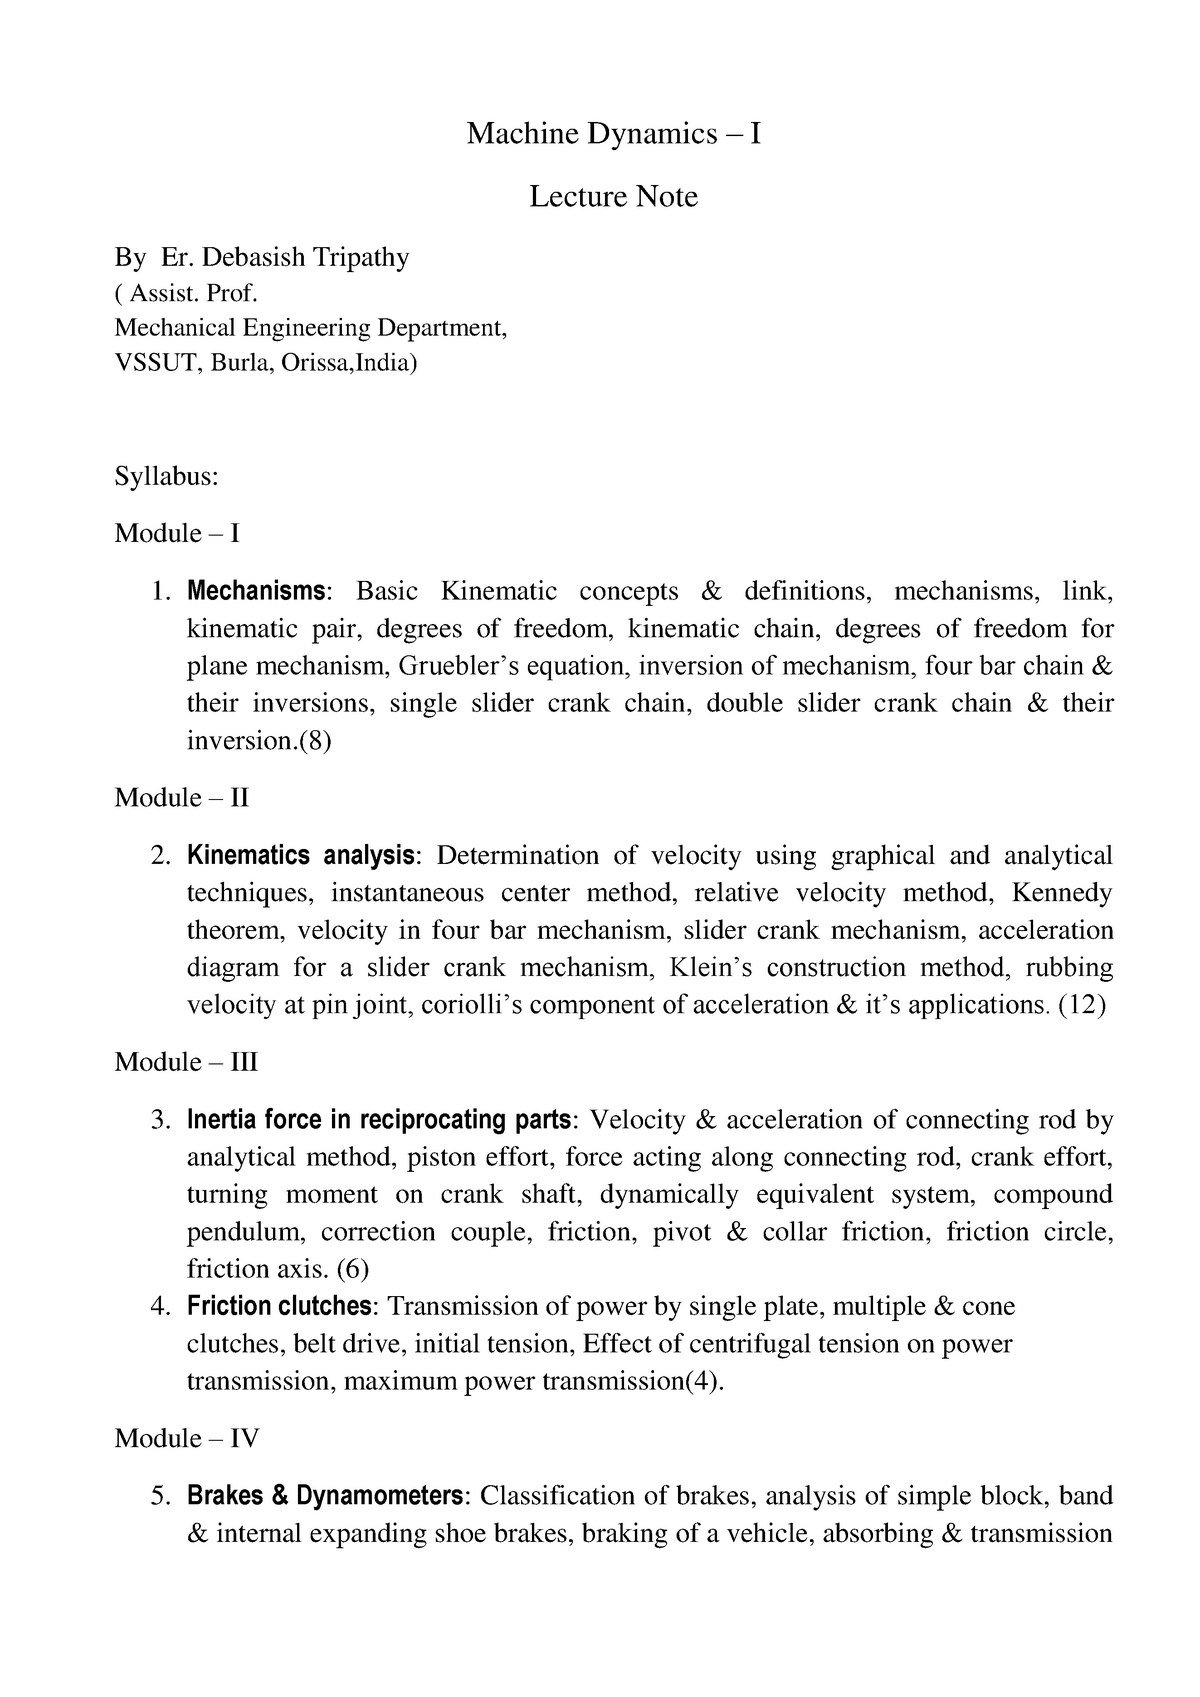 Machine dynamics -1 - Mechanical Engineering bdd - StuDocu